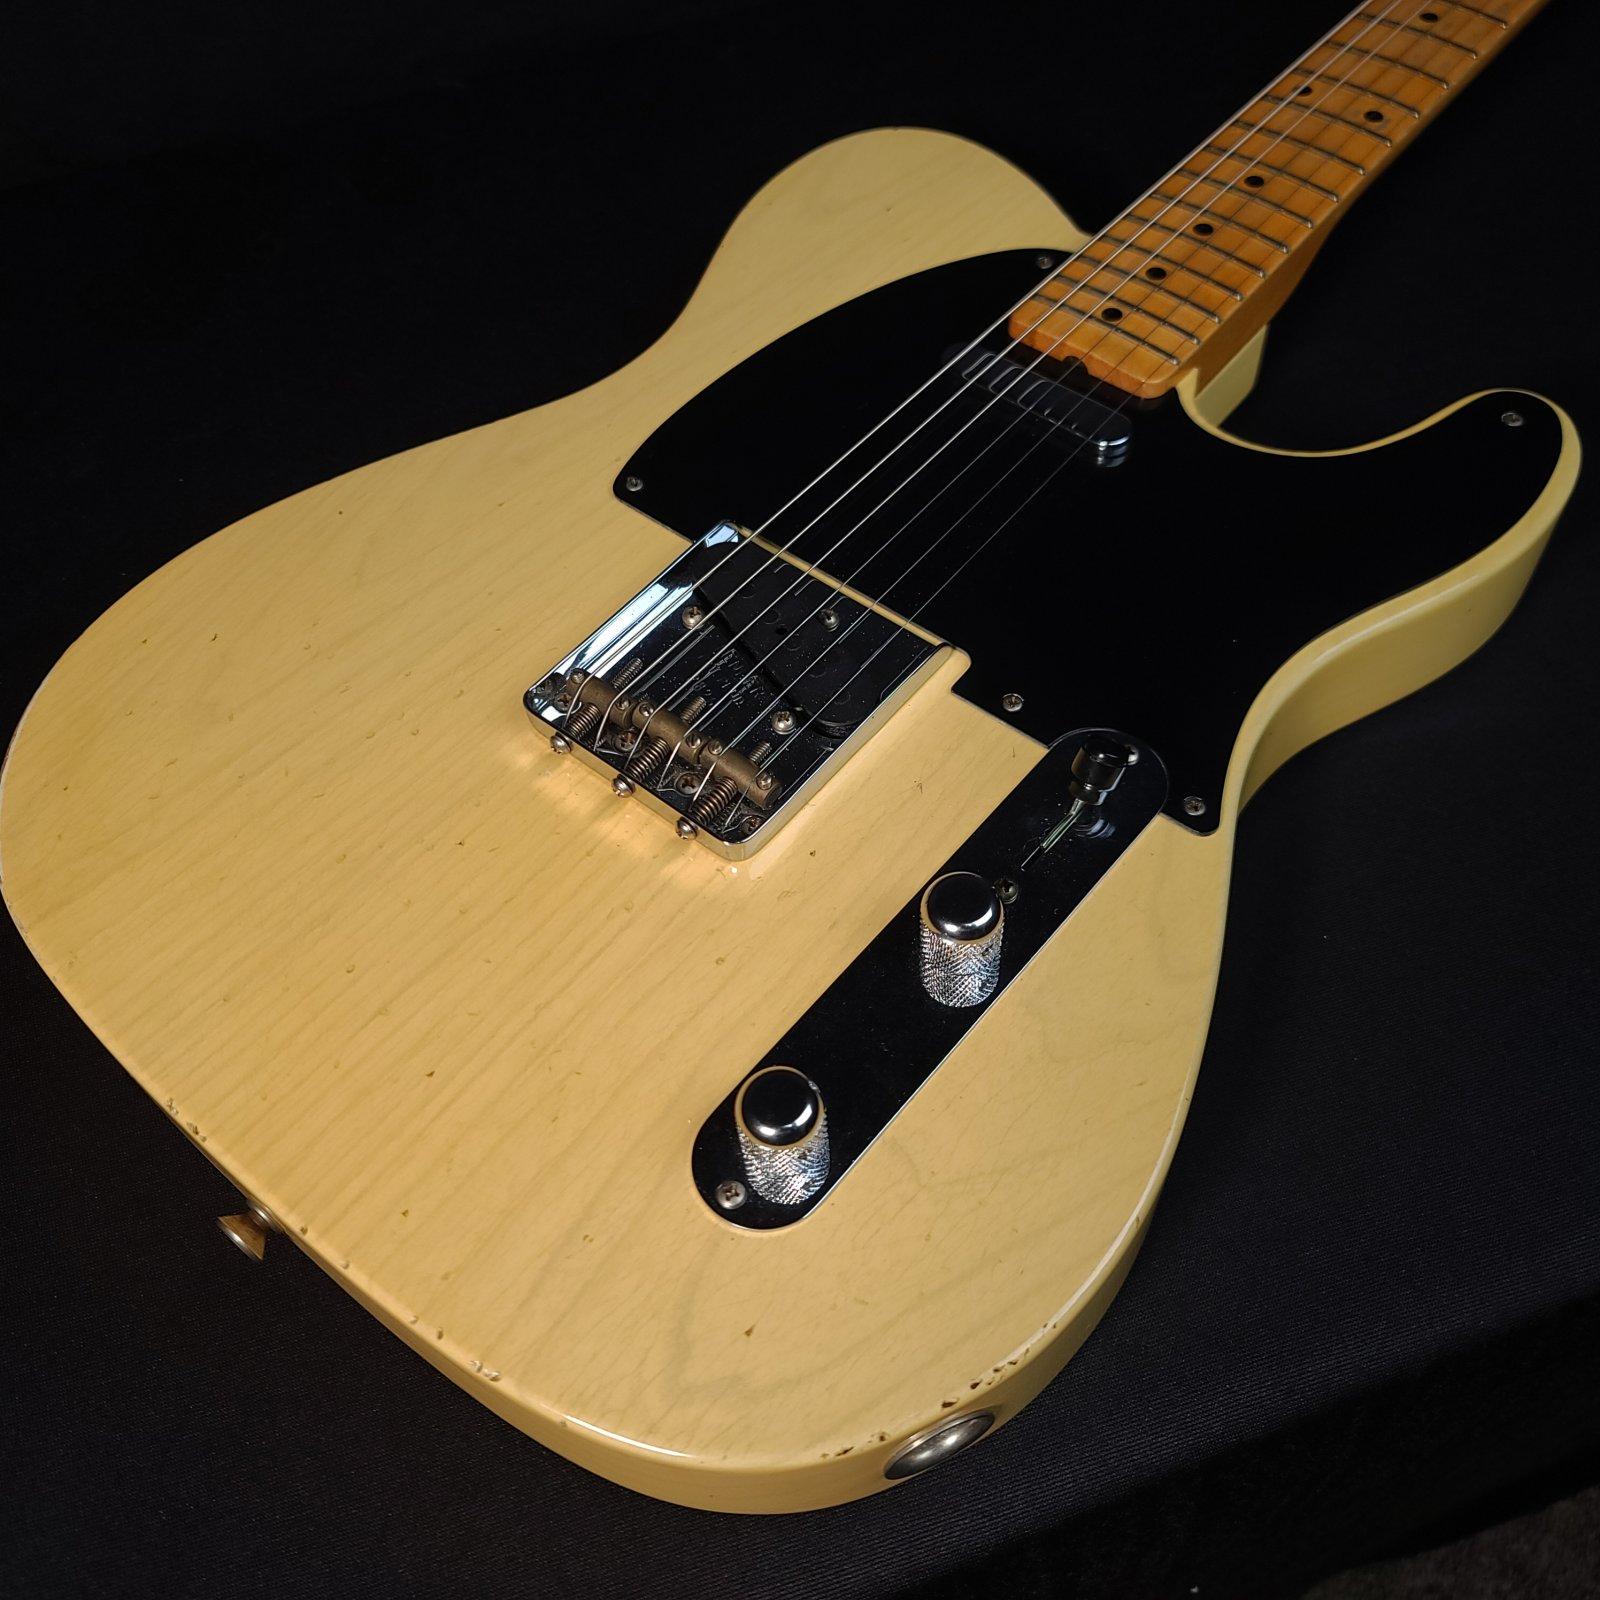 Used Fender Custom Shop 4/54 Blackguard Telecaster Blonde Willcutt Limited Nocaster U